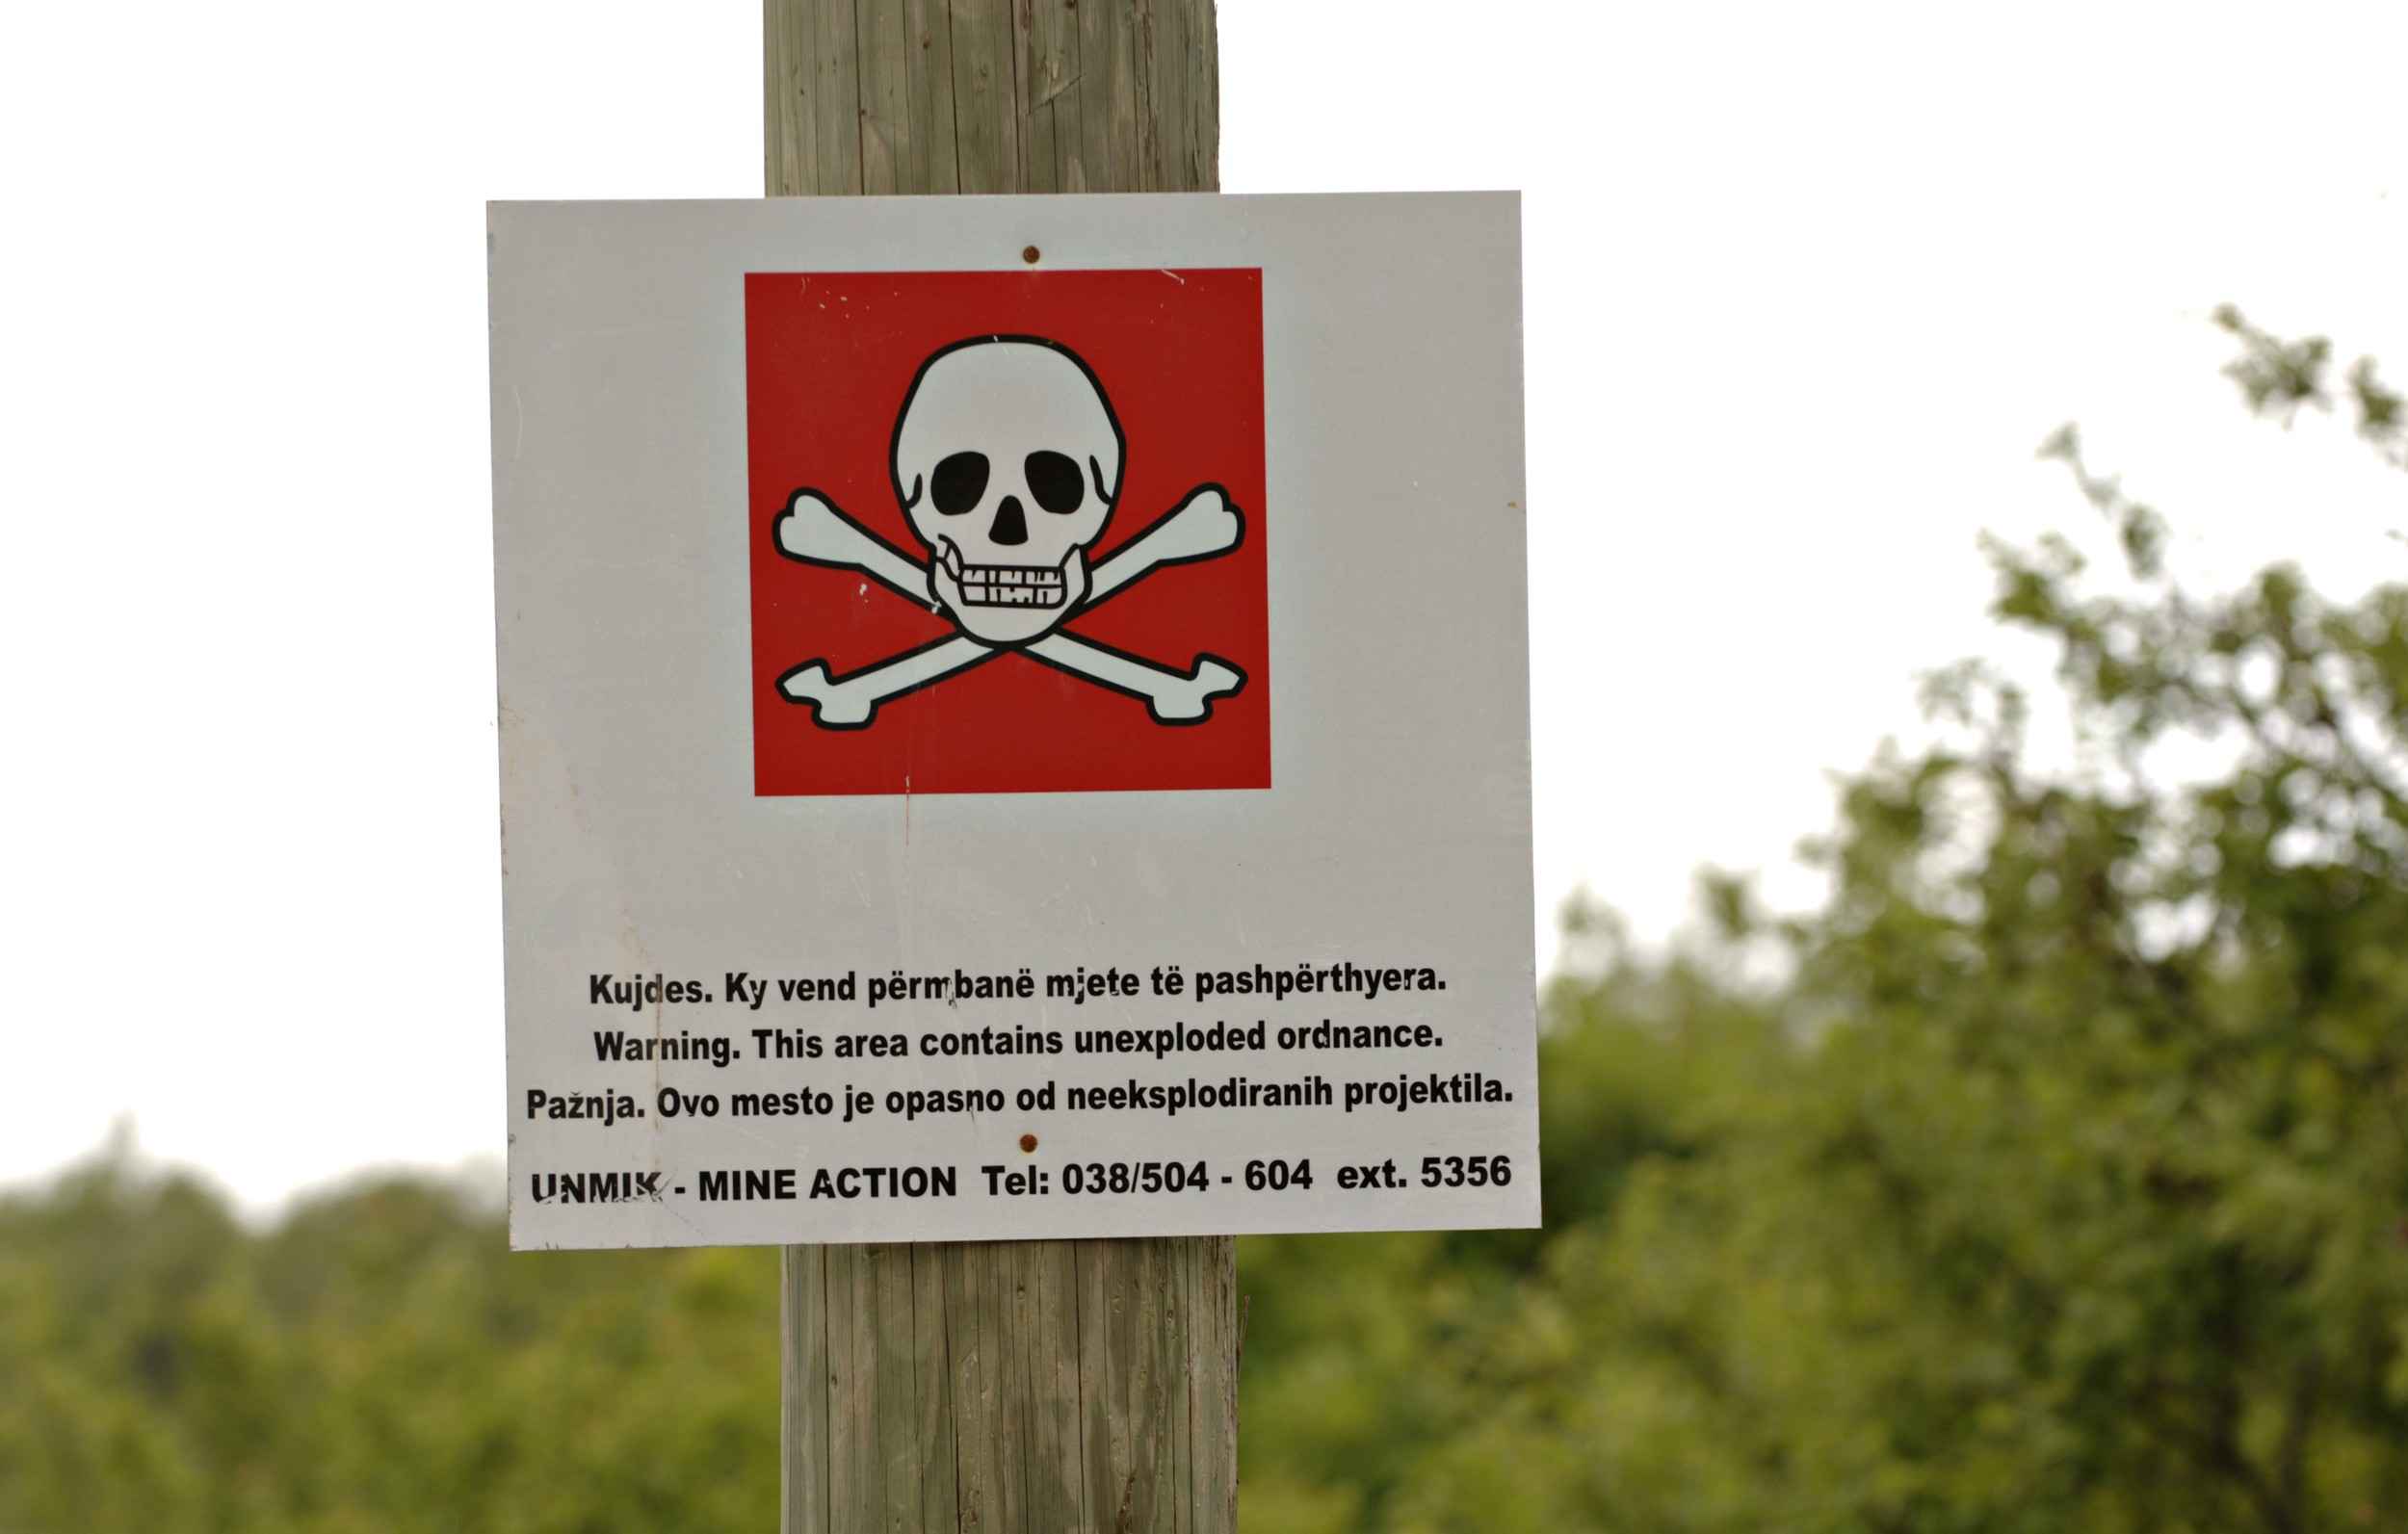 Kosovo:Warning sign on the danger of mines.©Saltbones, Olav/ICRC